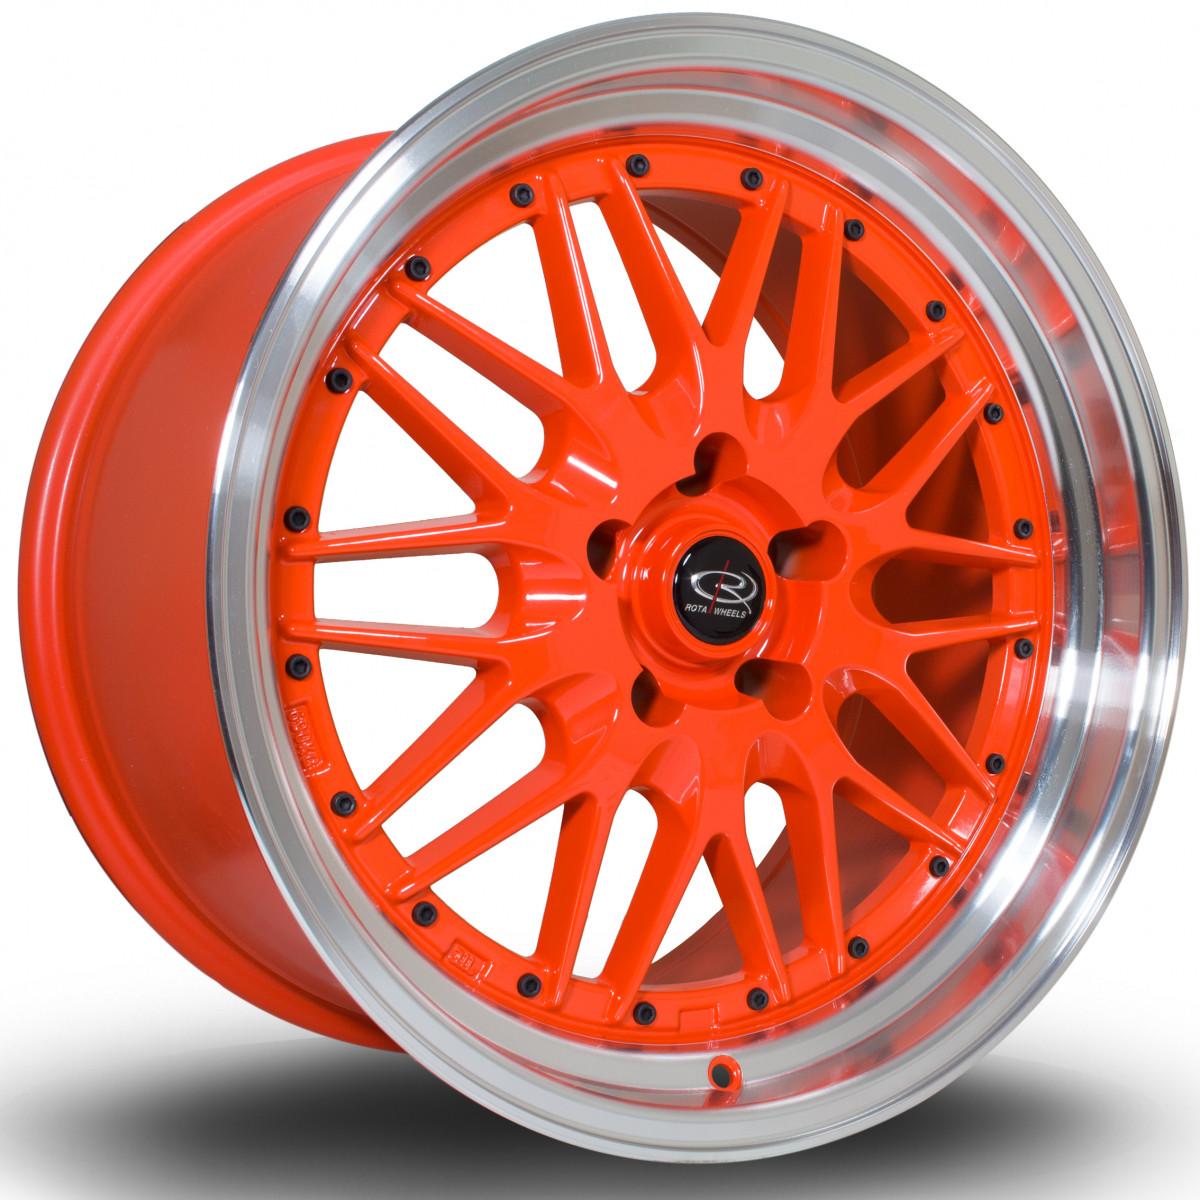 Kensei 18x10 5x114 ET22 Orange with Polished Lip